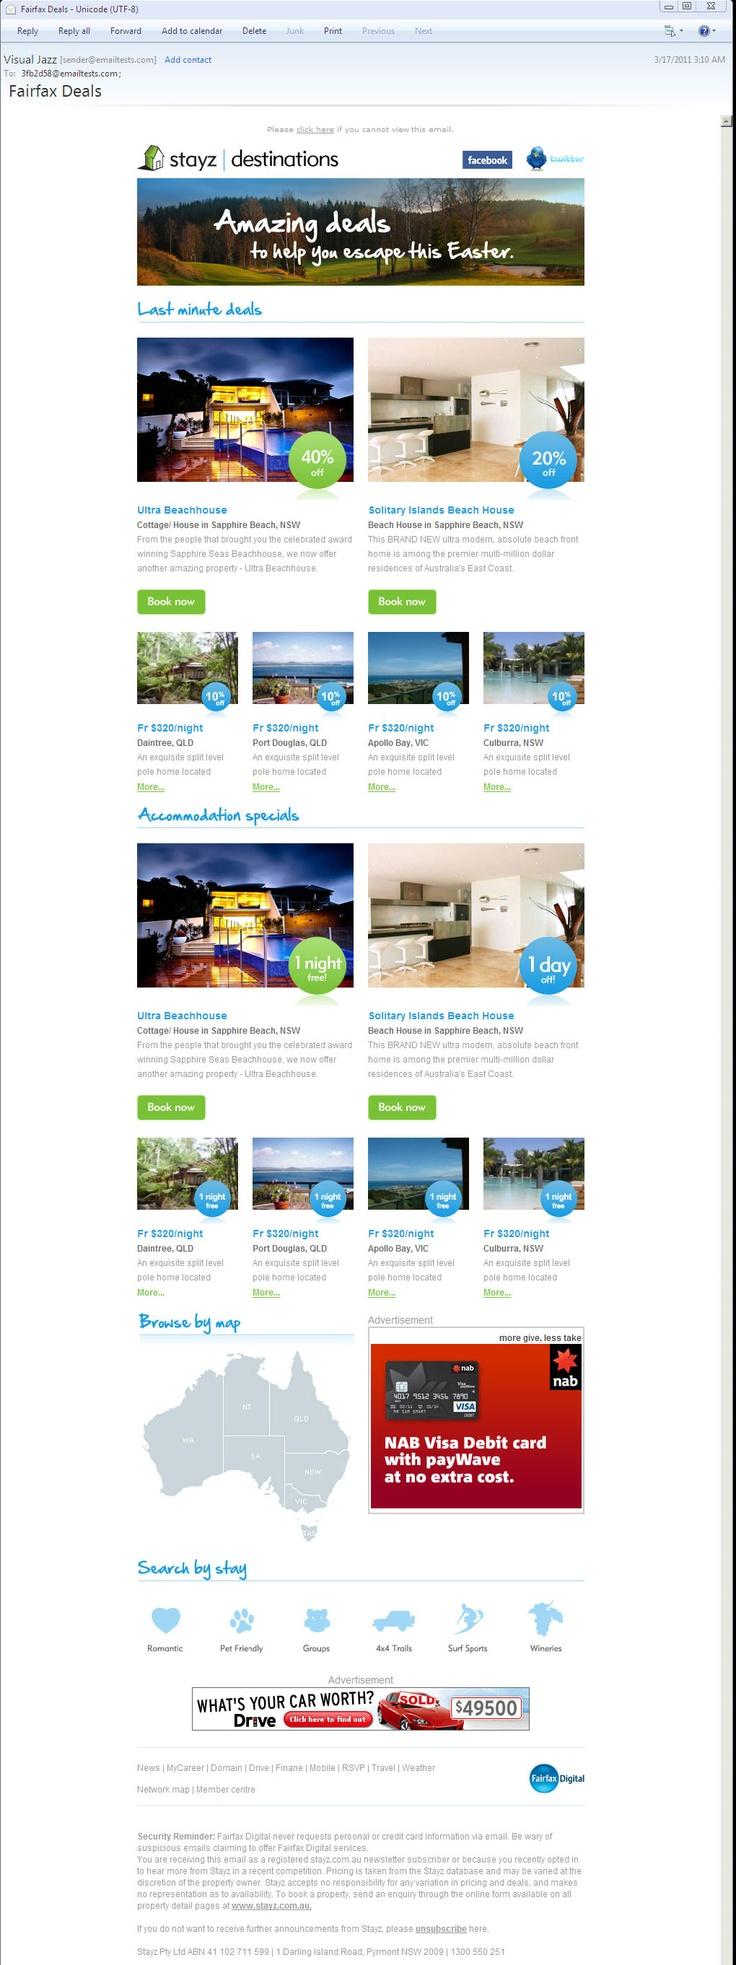 Various EDMs - http://ronaldjusuf.wordpress.com/2013/02/20/electronic-direct-marketing-edm/